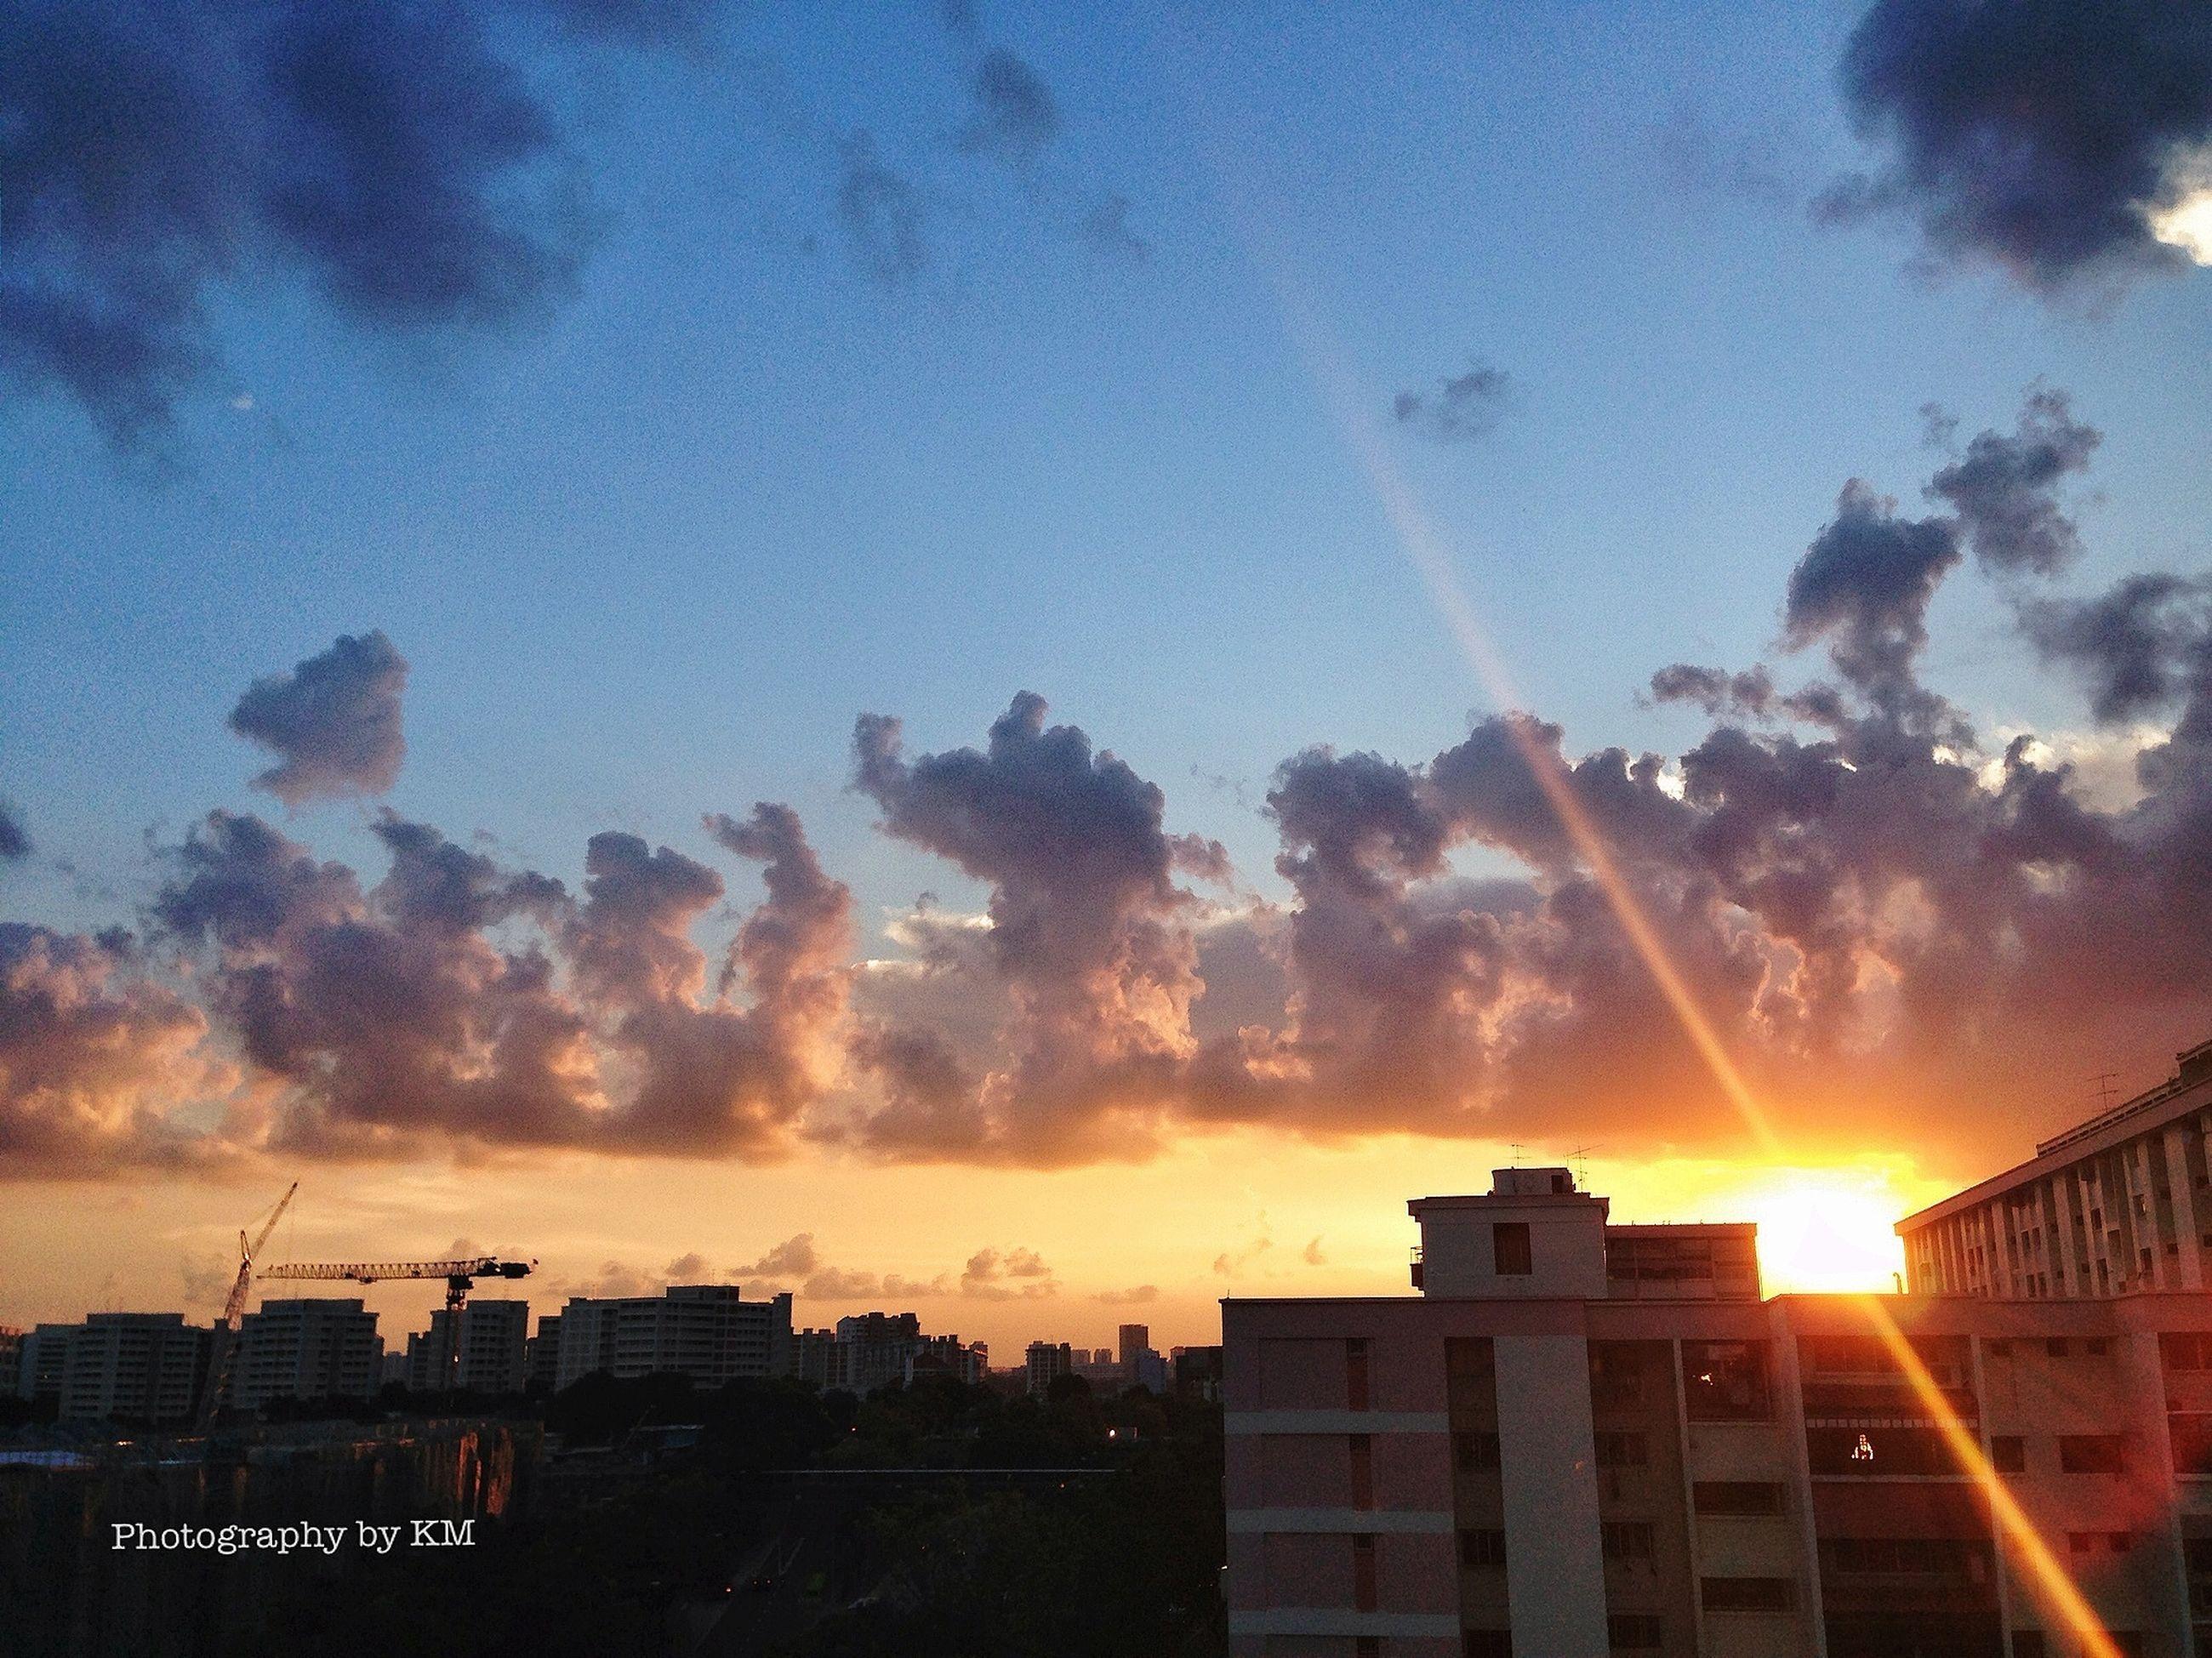 sun, sunset, building exterior, architecture, built structure, sunbeam, sky, sunlight, cloud - sky, lens flare, city, orange color, silhouette, nature, cityscape, beauty in nature, outdoors, scenics, no people, building